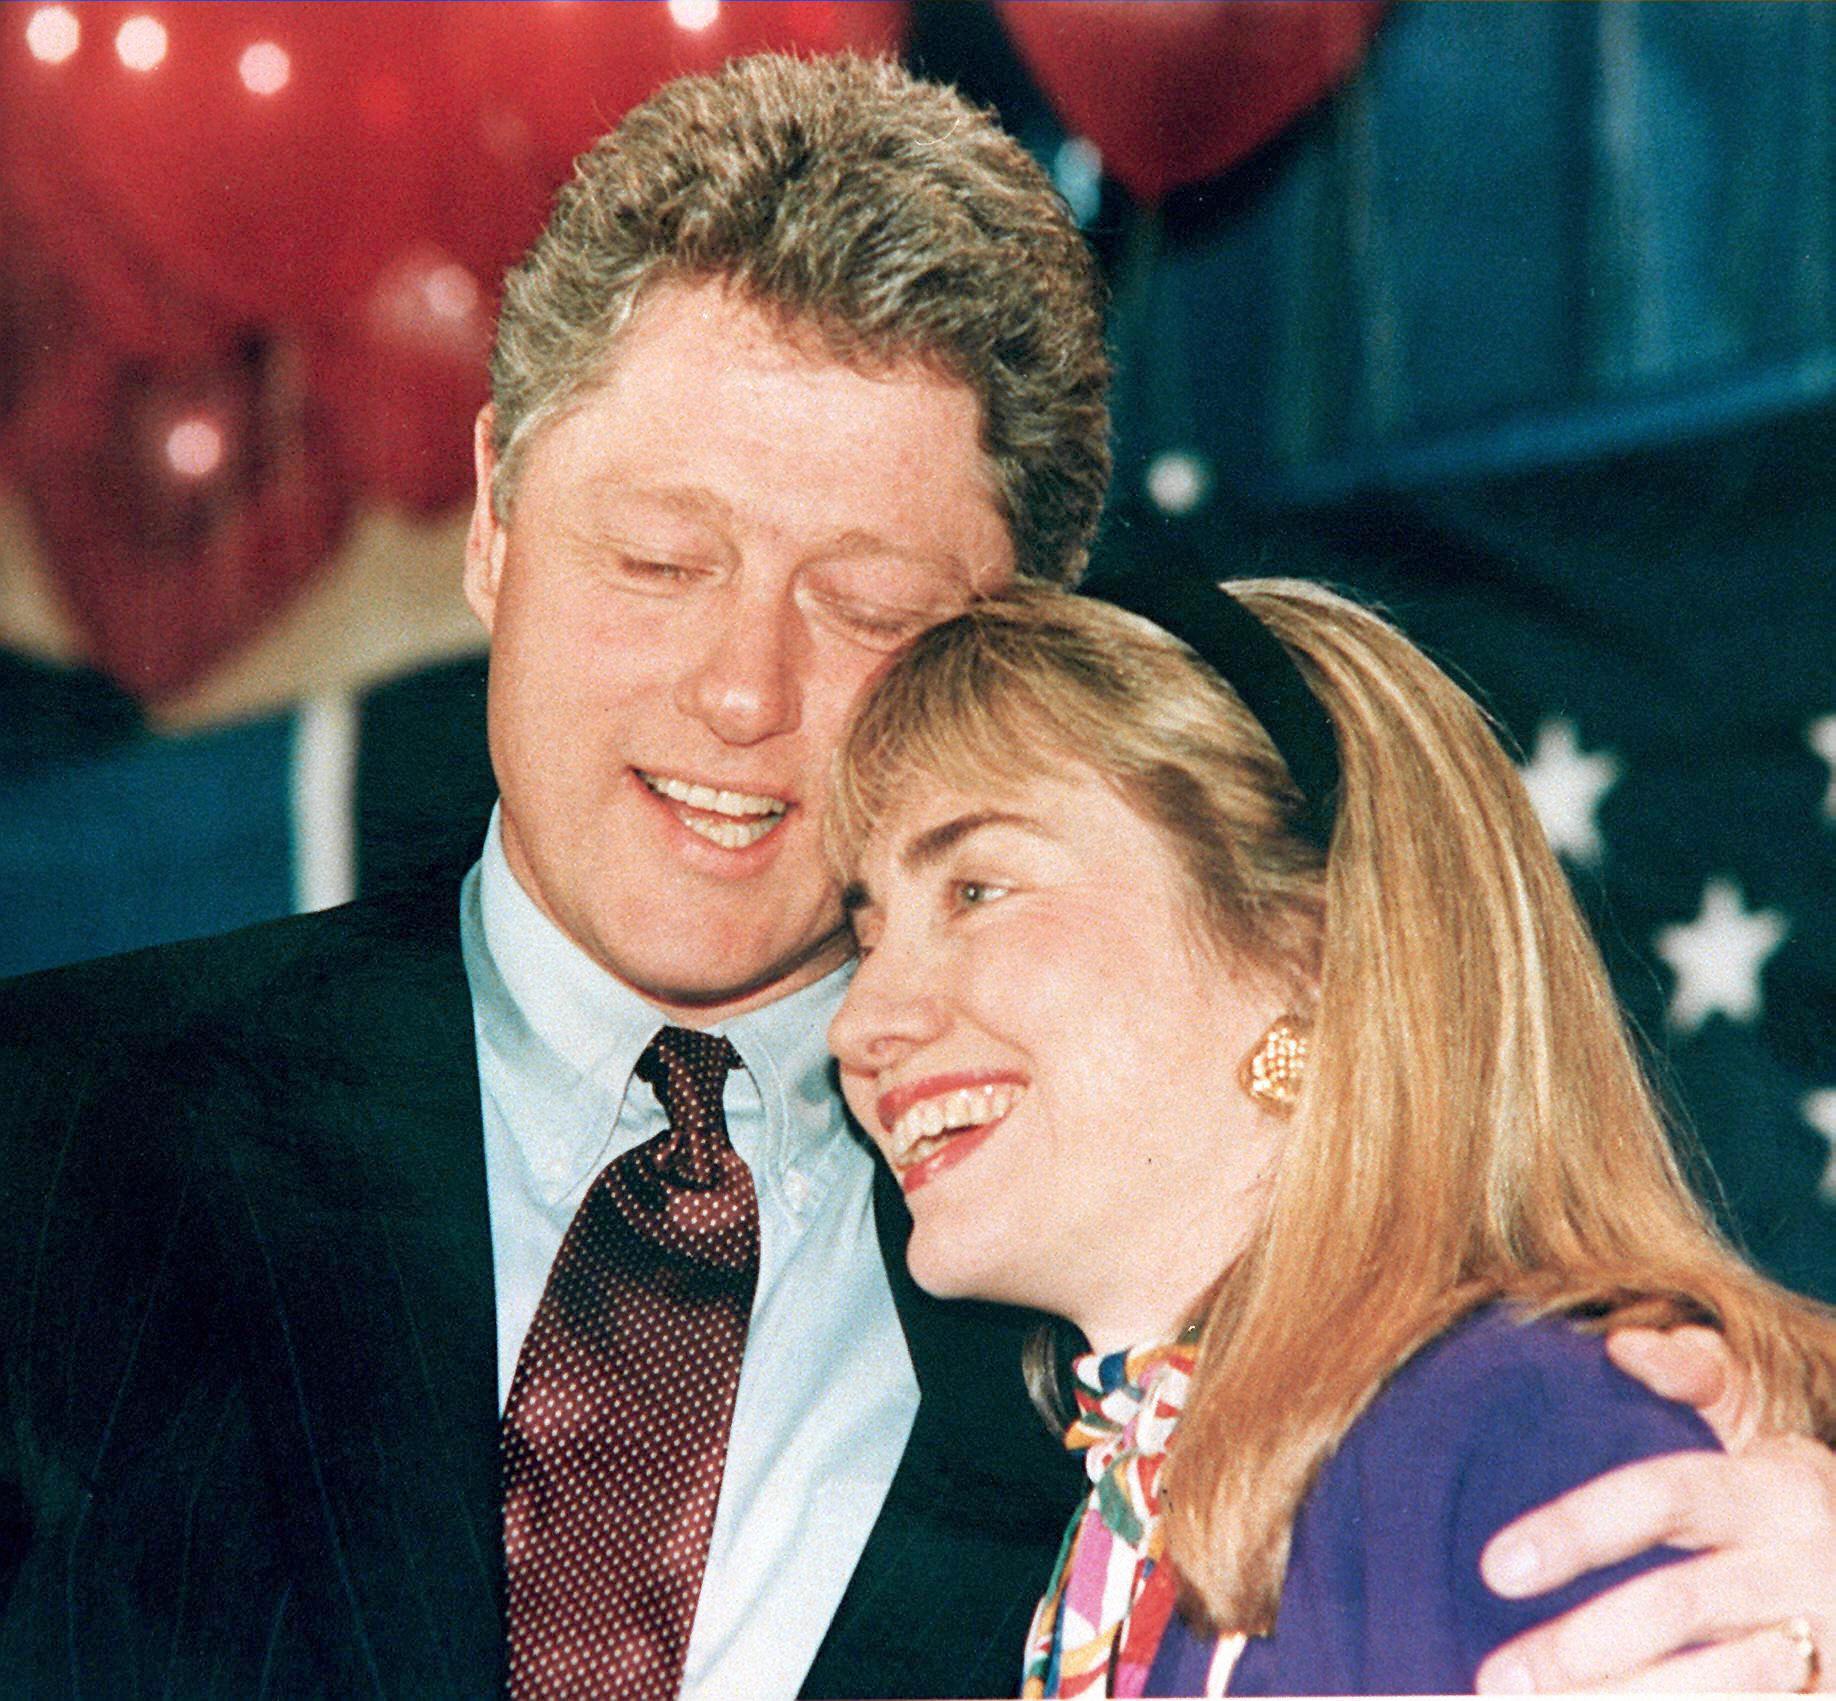 Clinton and Hillary